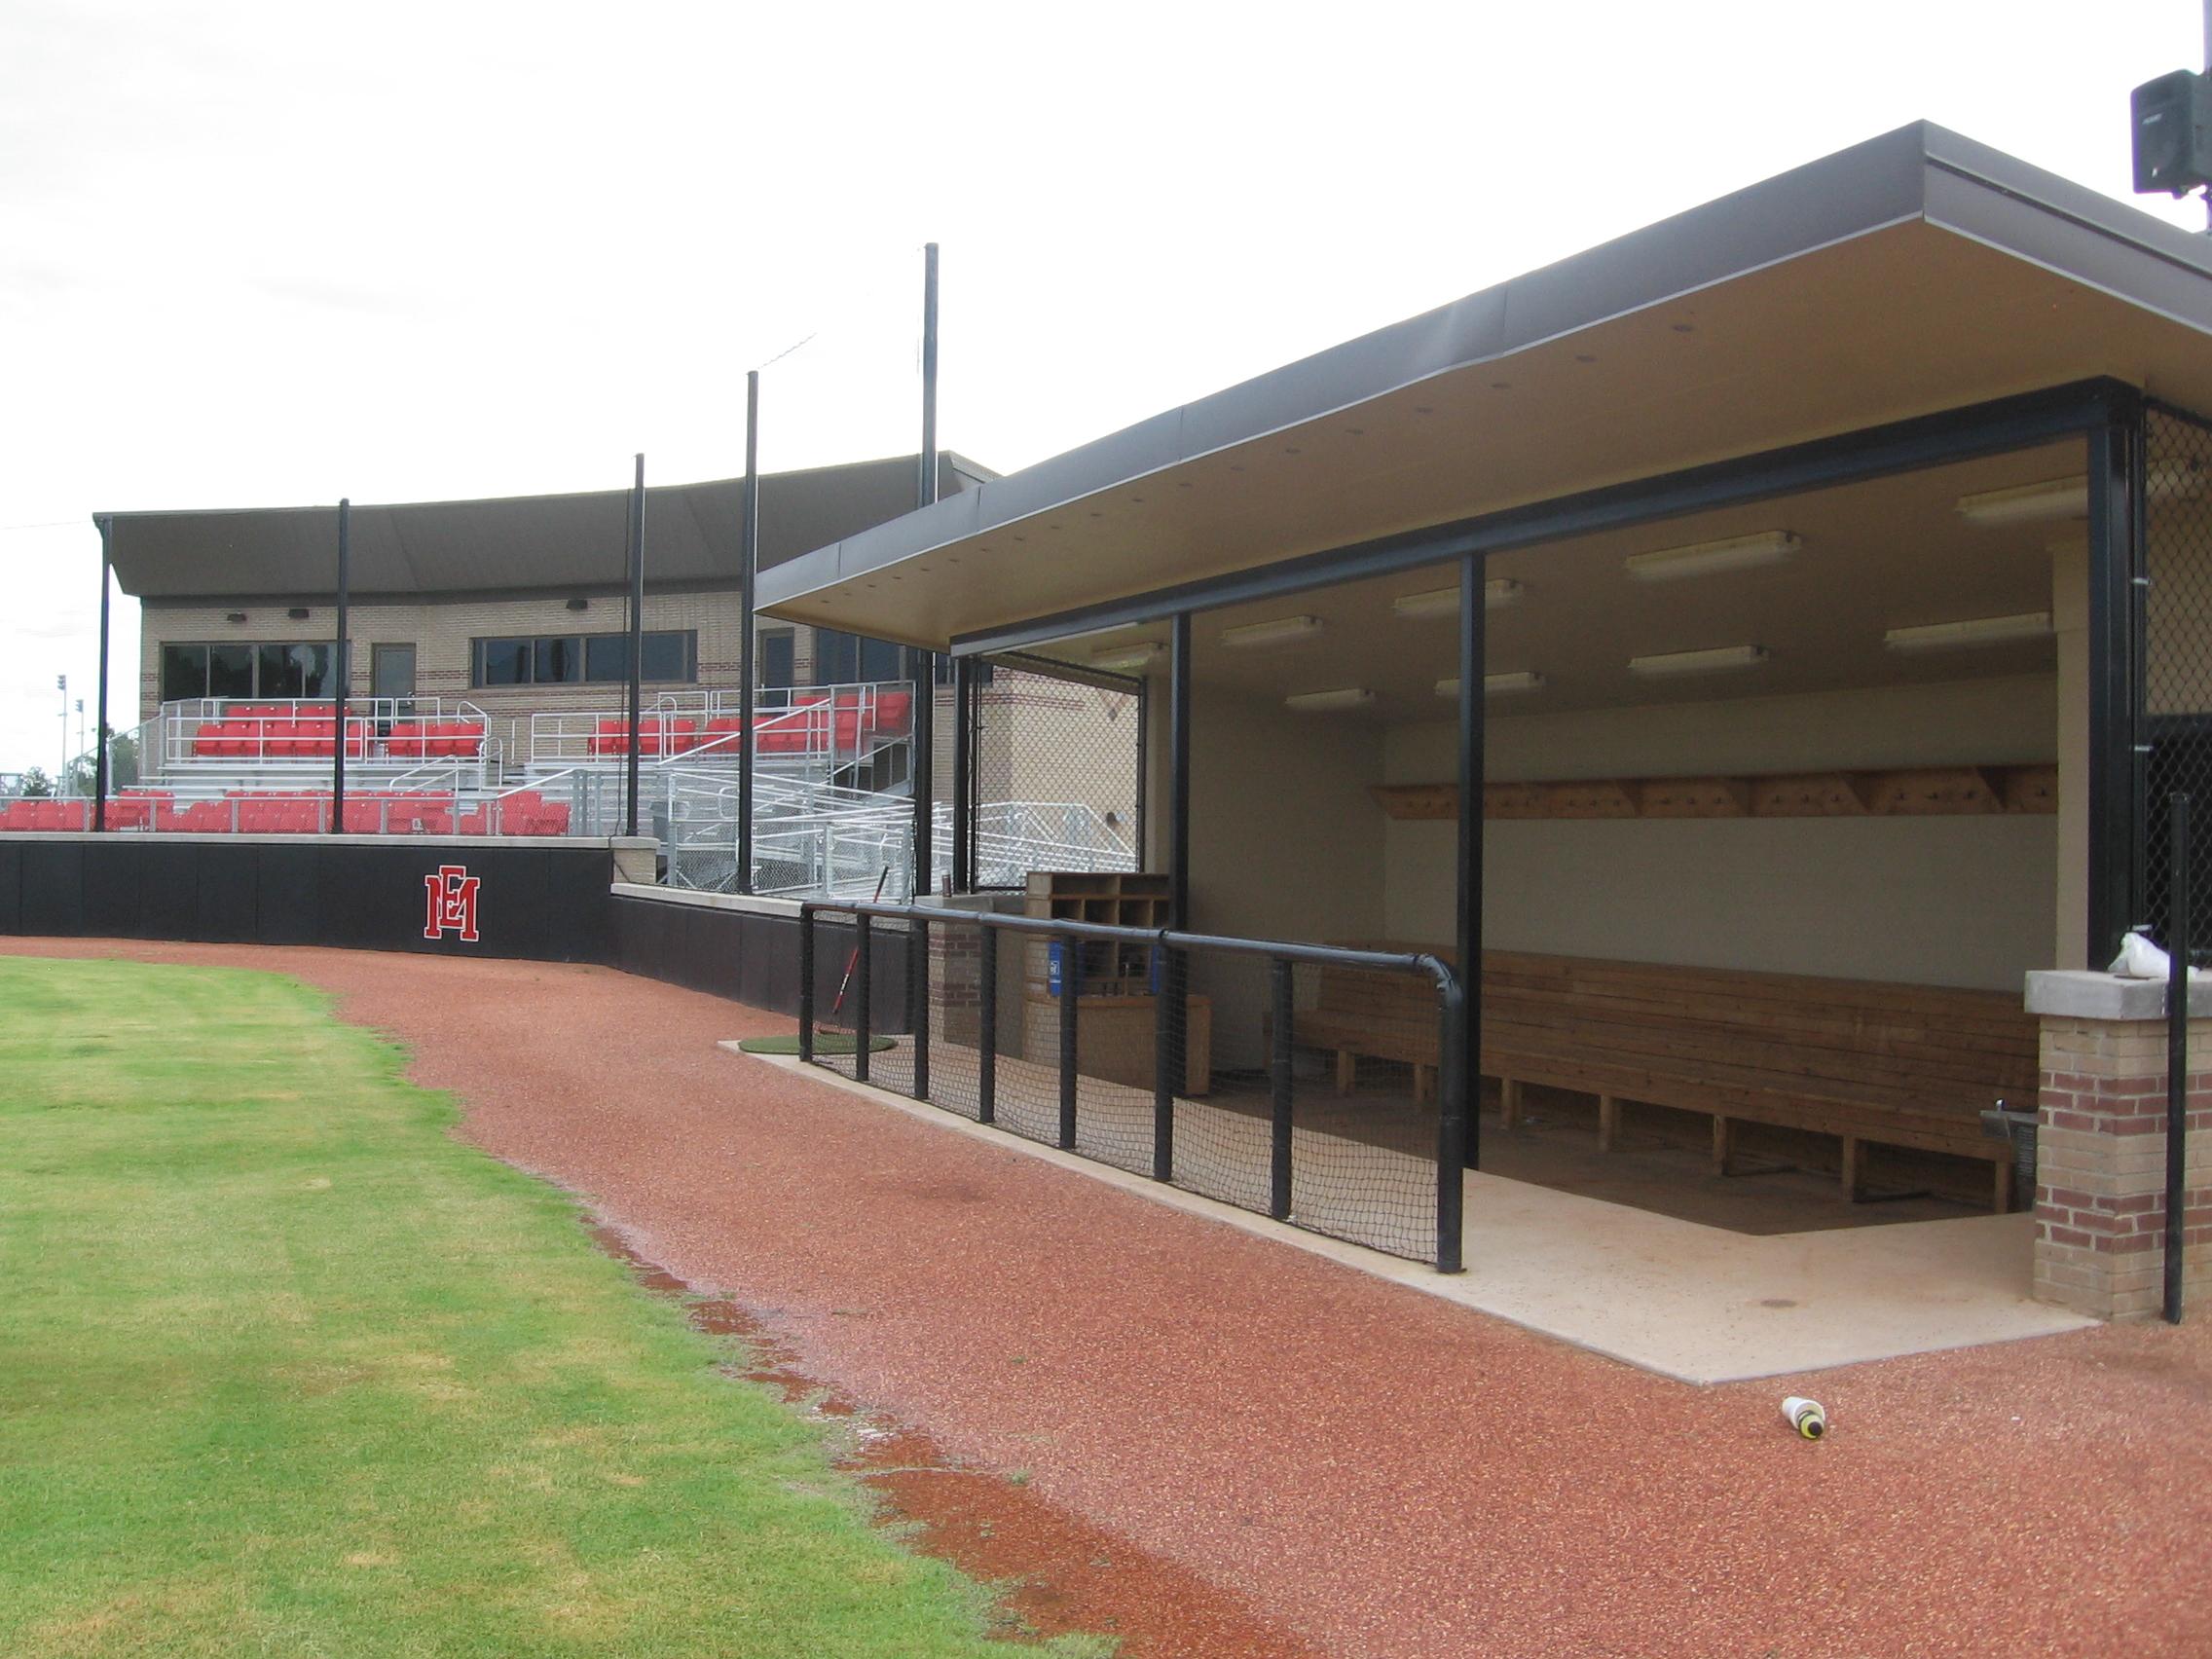 Gerald Poole Baseball Field